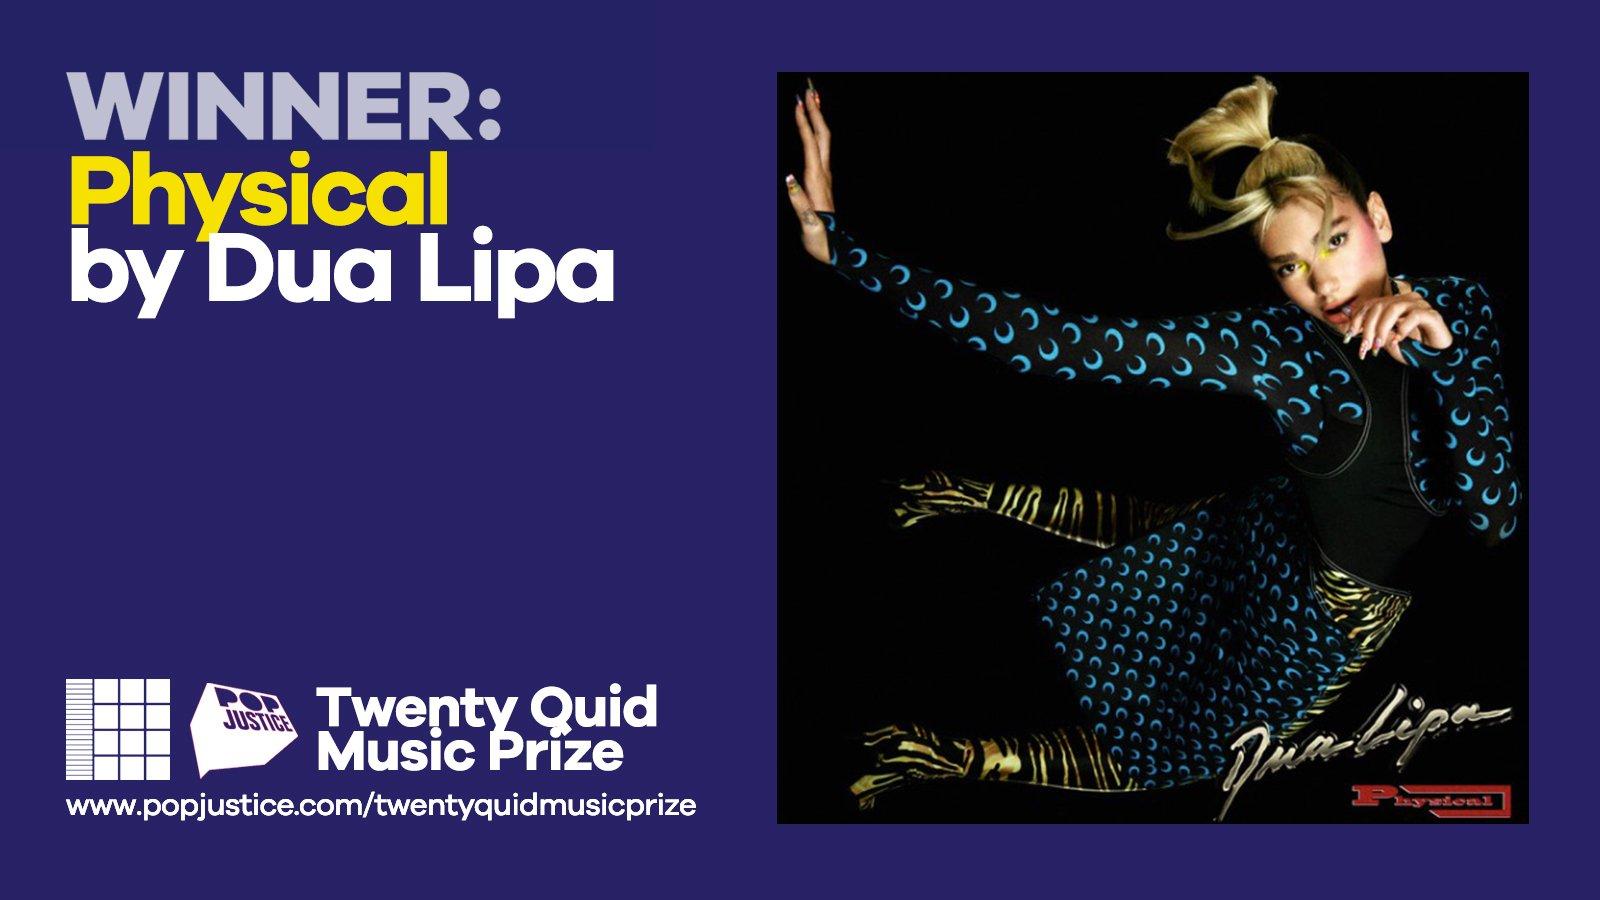 Twenty Quid 2020: Dua Lipa is the winner